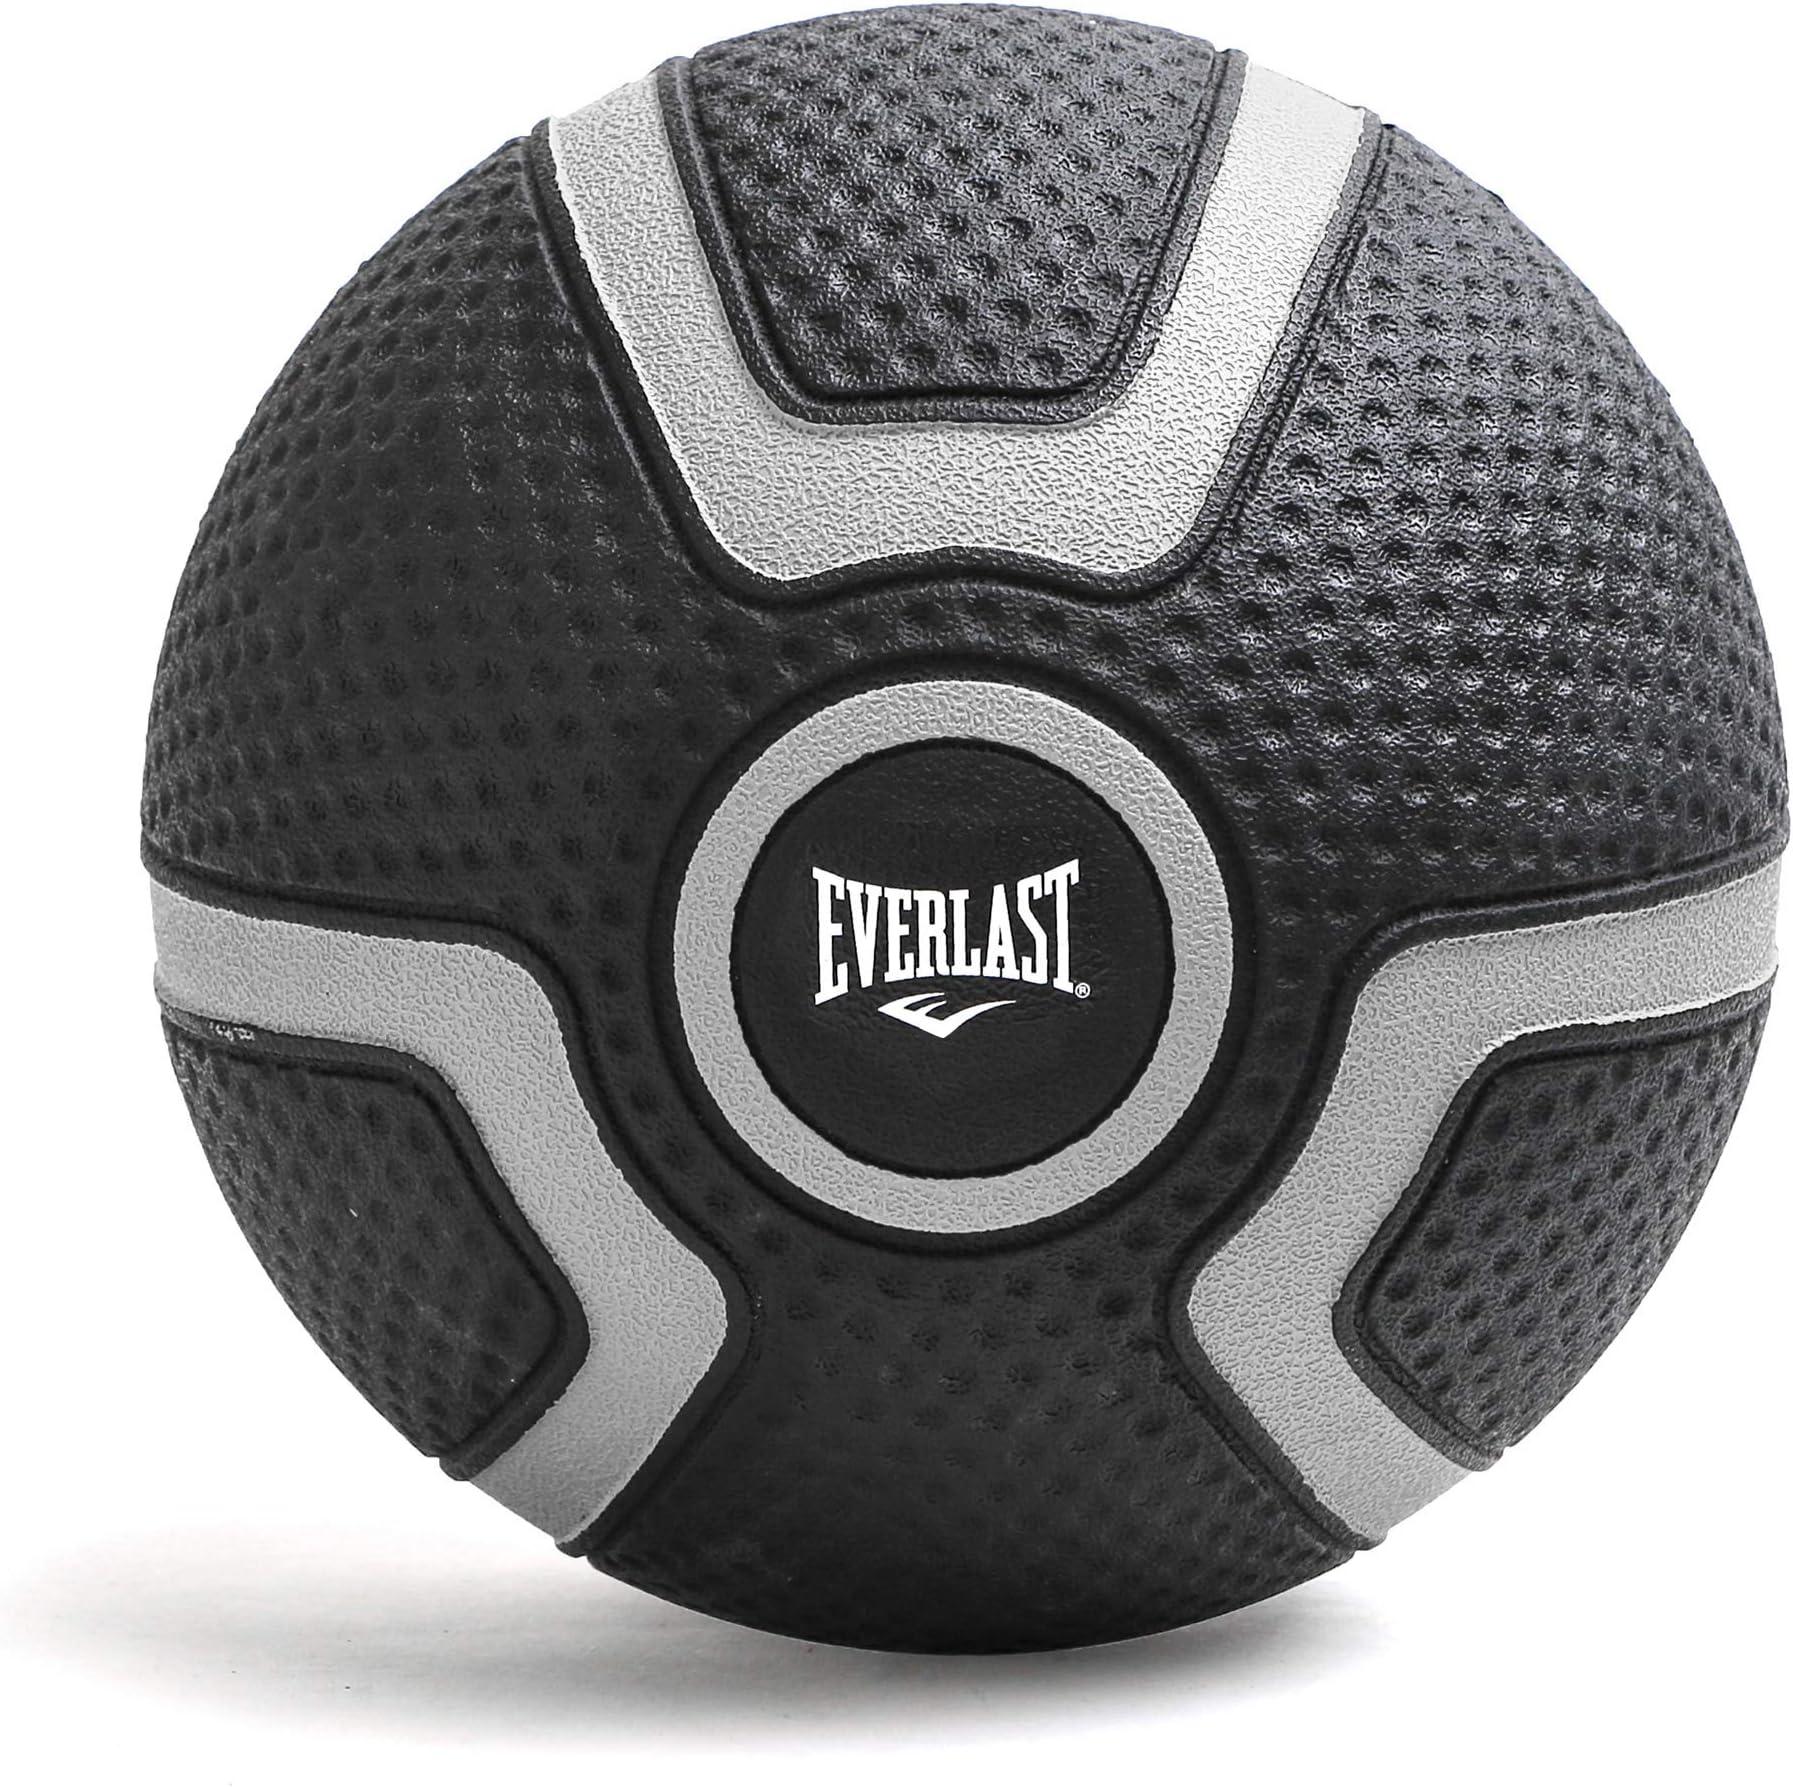 Everlast Tough Grip 4LB Medicine Ball Medicine Ball